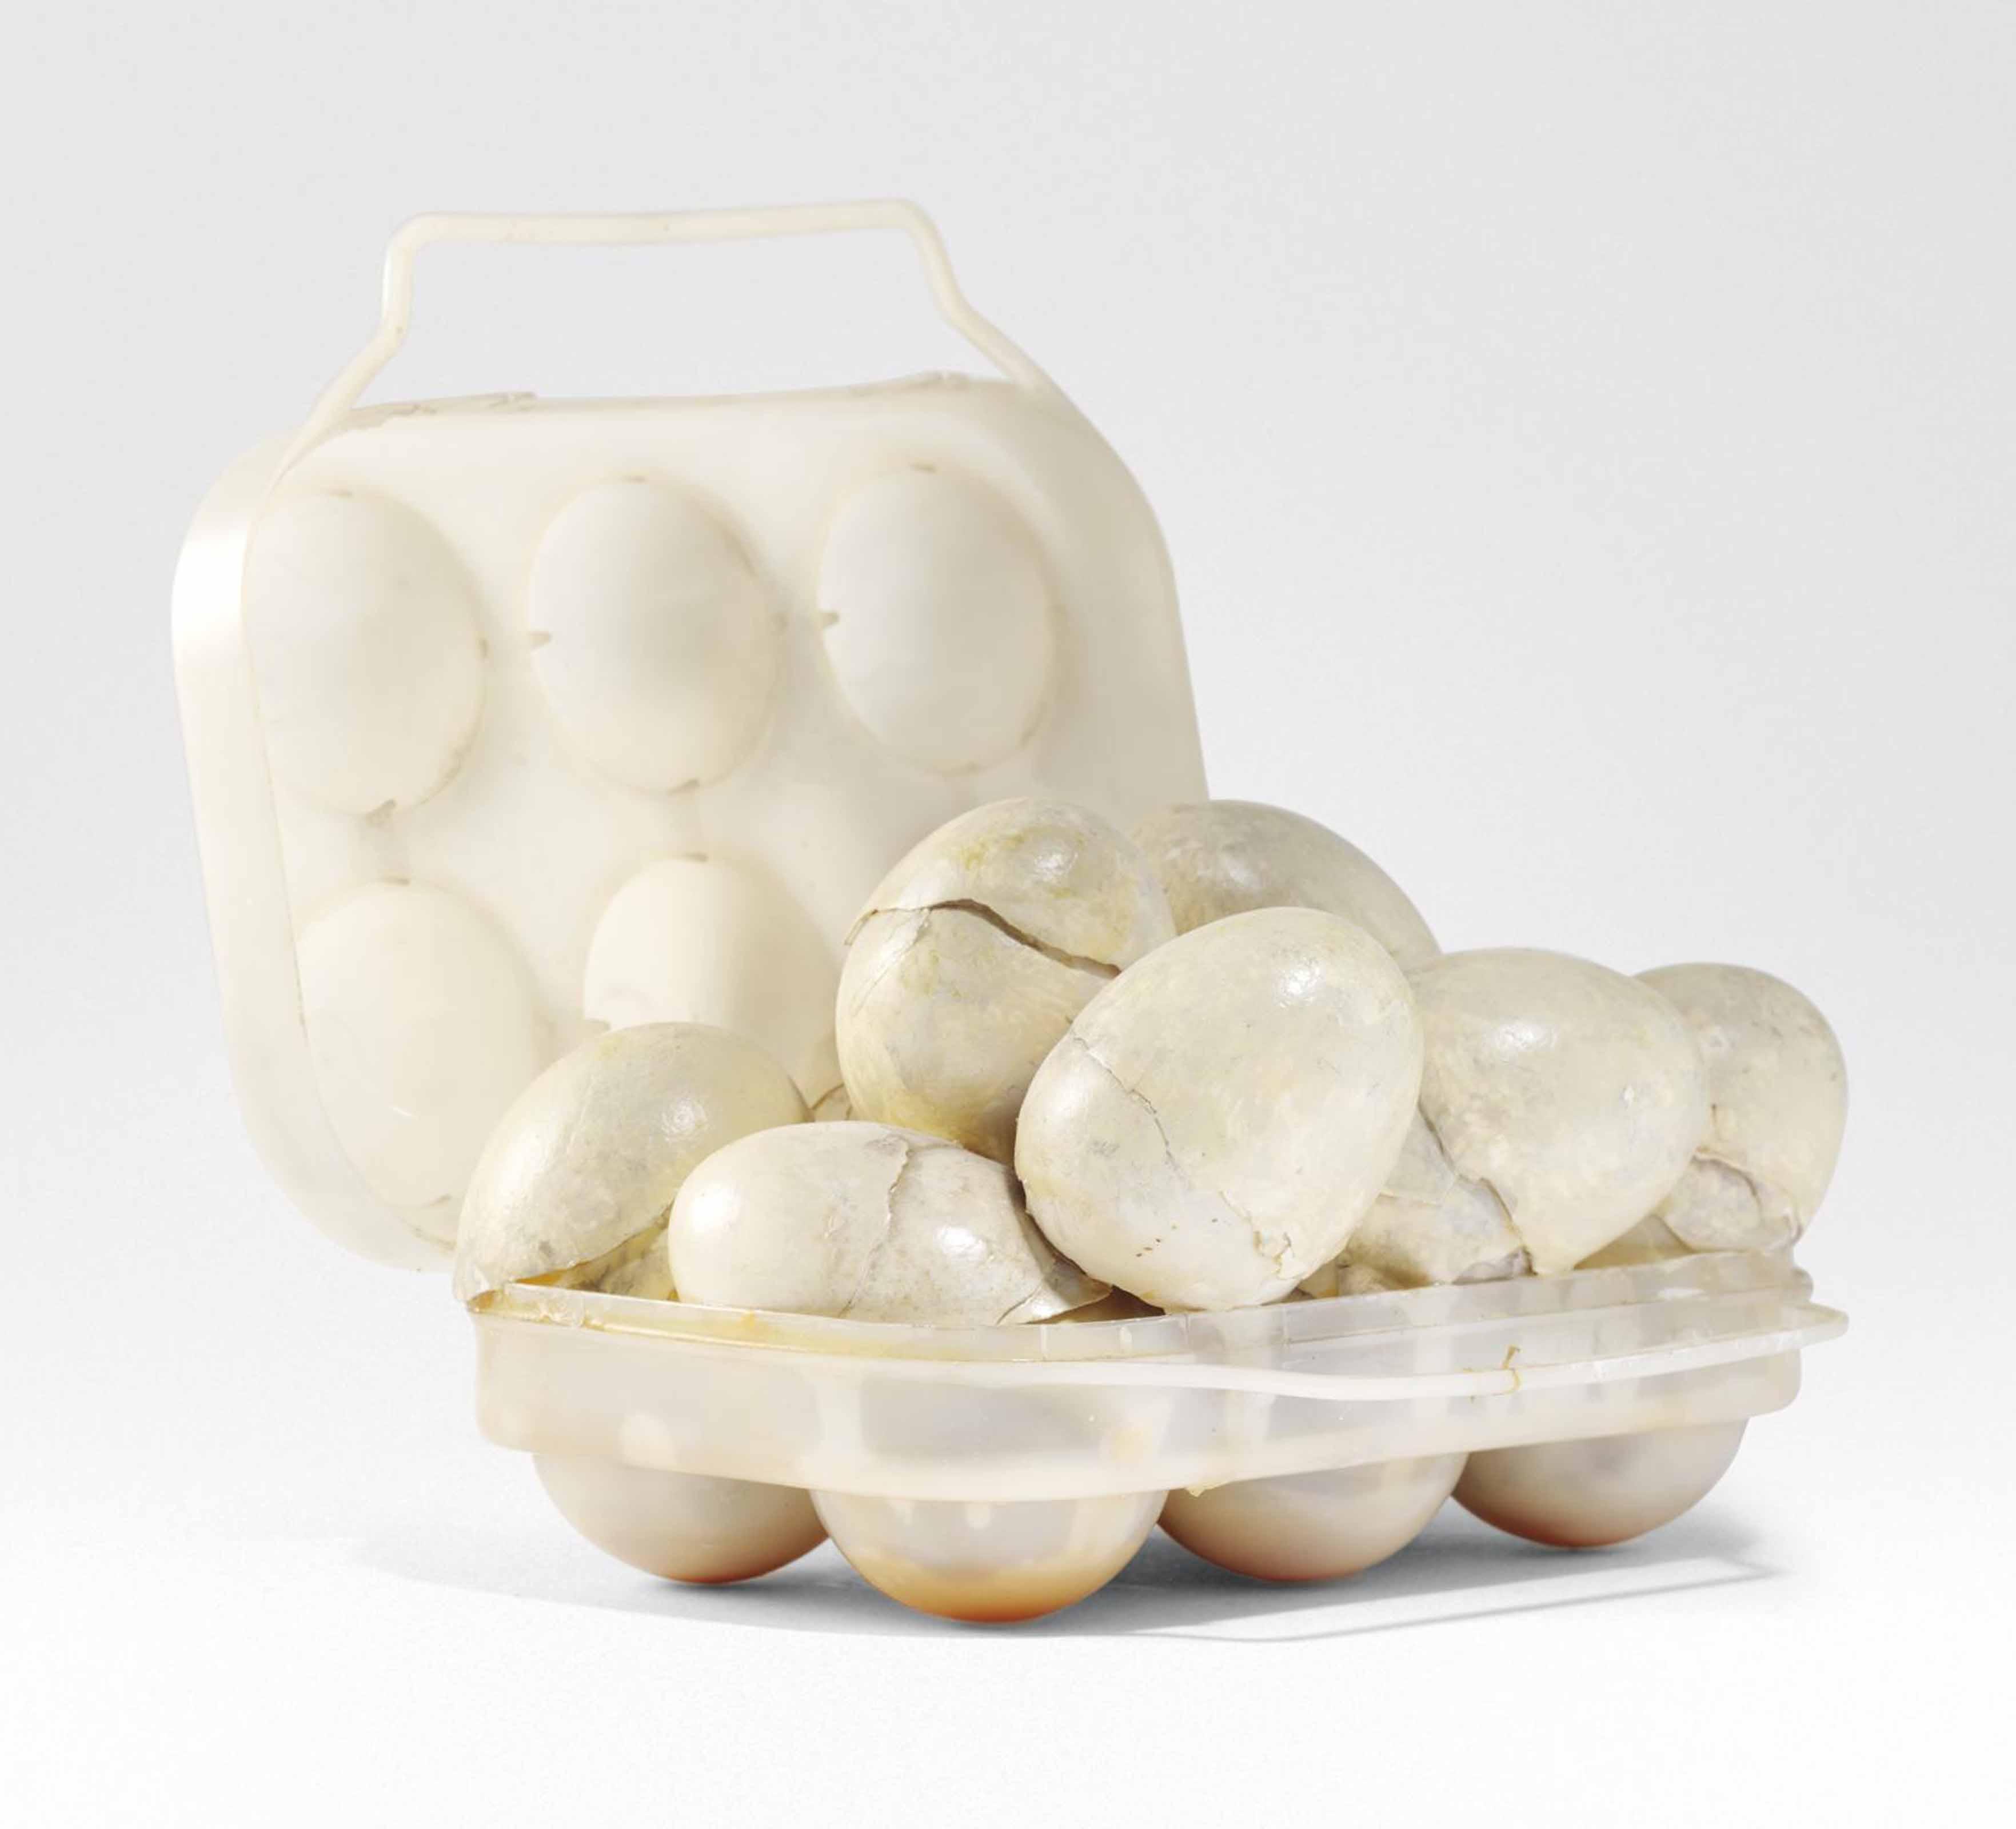 Oeufs (Eggs)